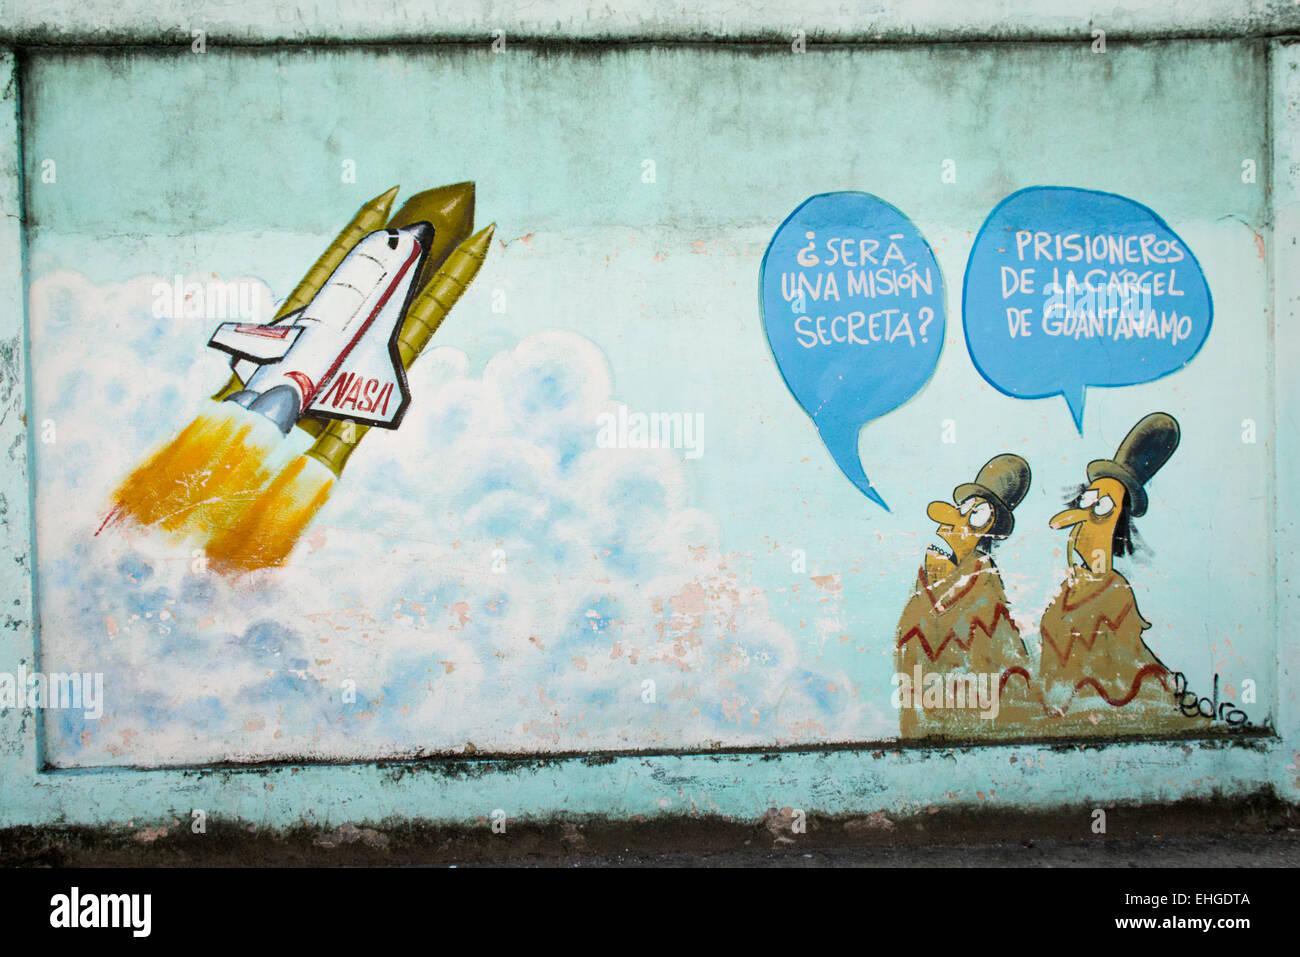 Cuba-Santa Clara Reihe politische Extreme anti-USA North American Cartoon cartoons Wandbilder Wände Rakete Stockbild